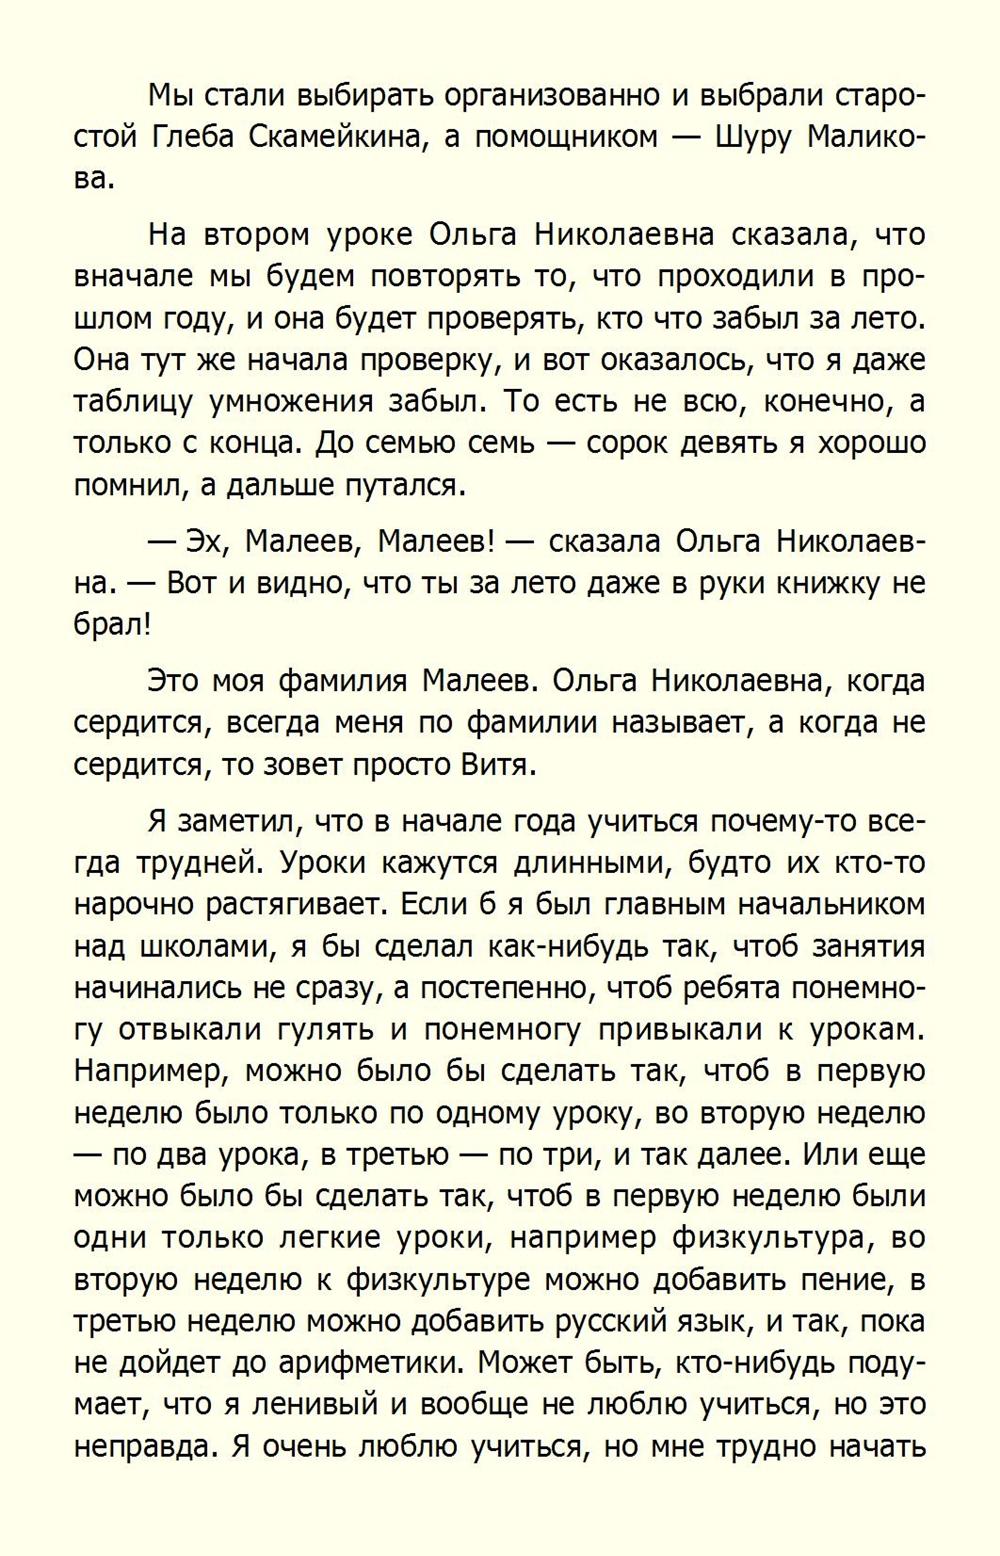 http://ipic.su/img/img7/fs/03.1598002074.jpg